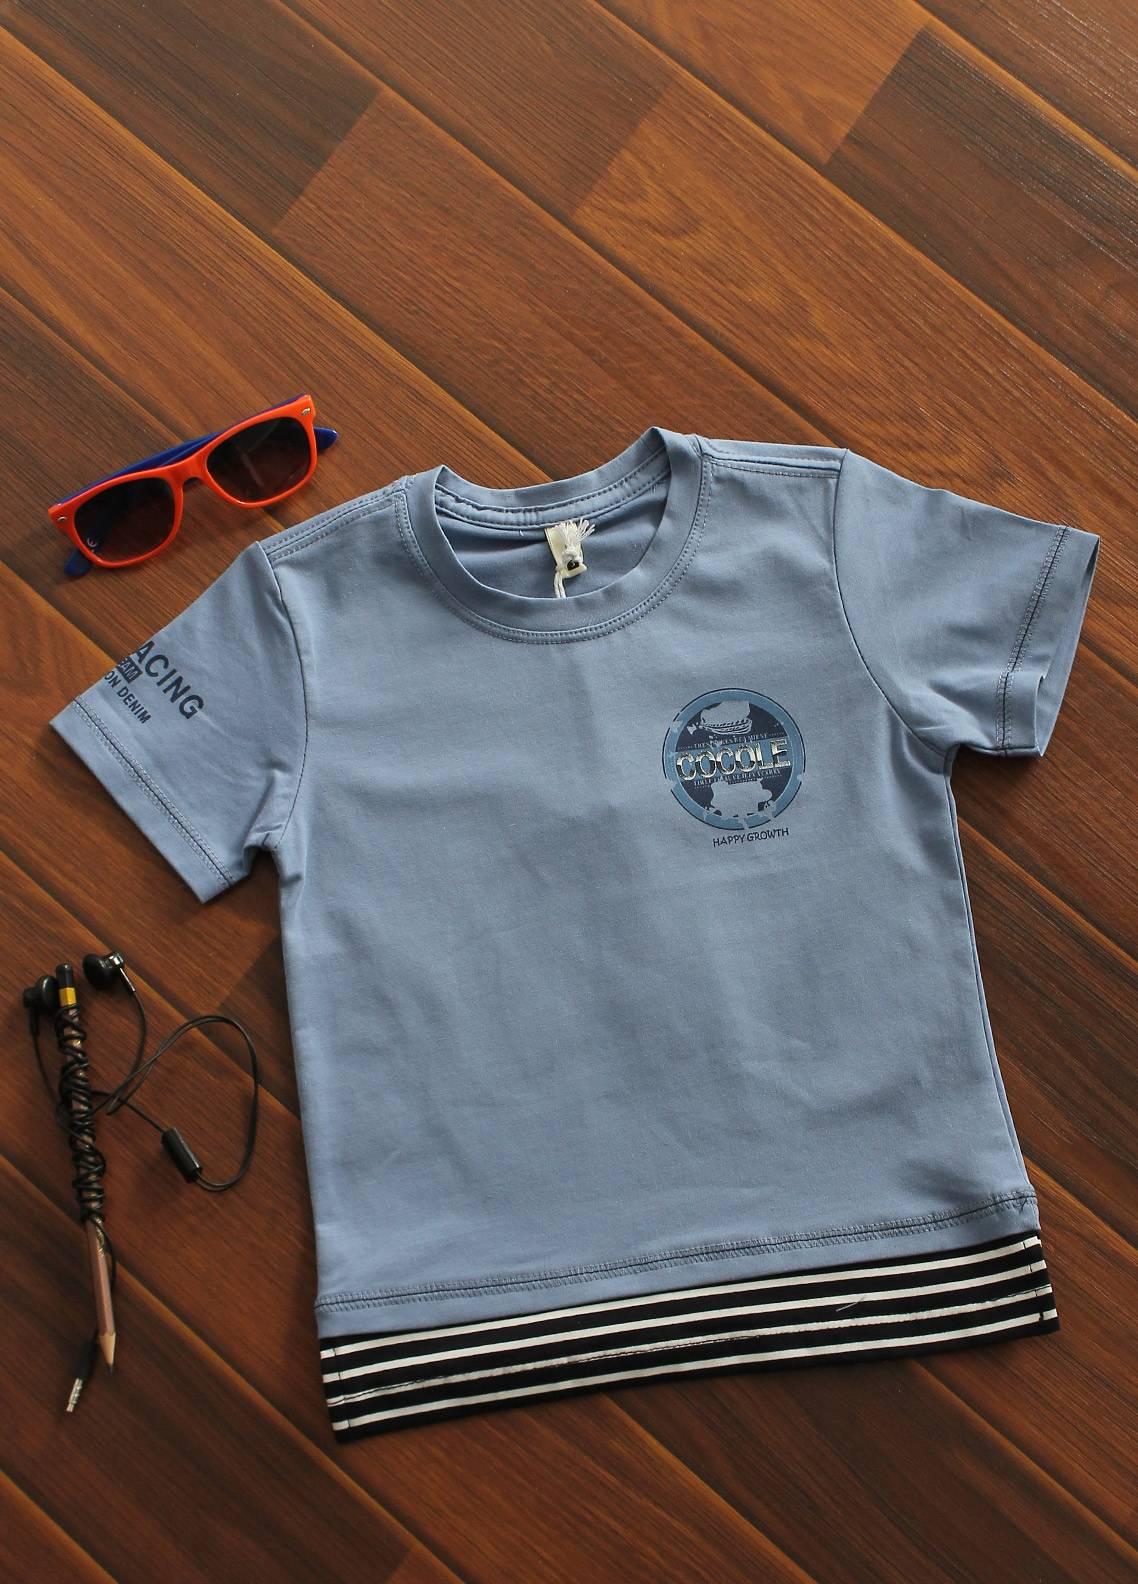 Sanaulla Exclusive Range Cotton Printed T-Shirts for Boys -  19042 Sky Blue